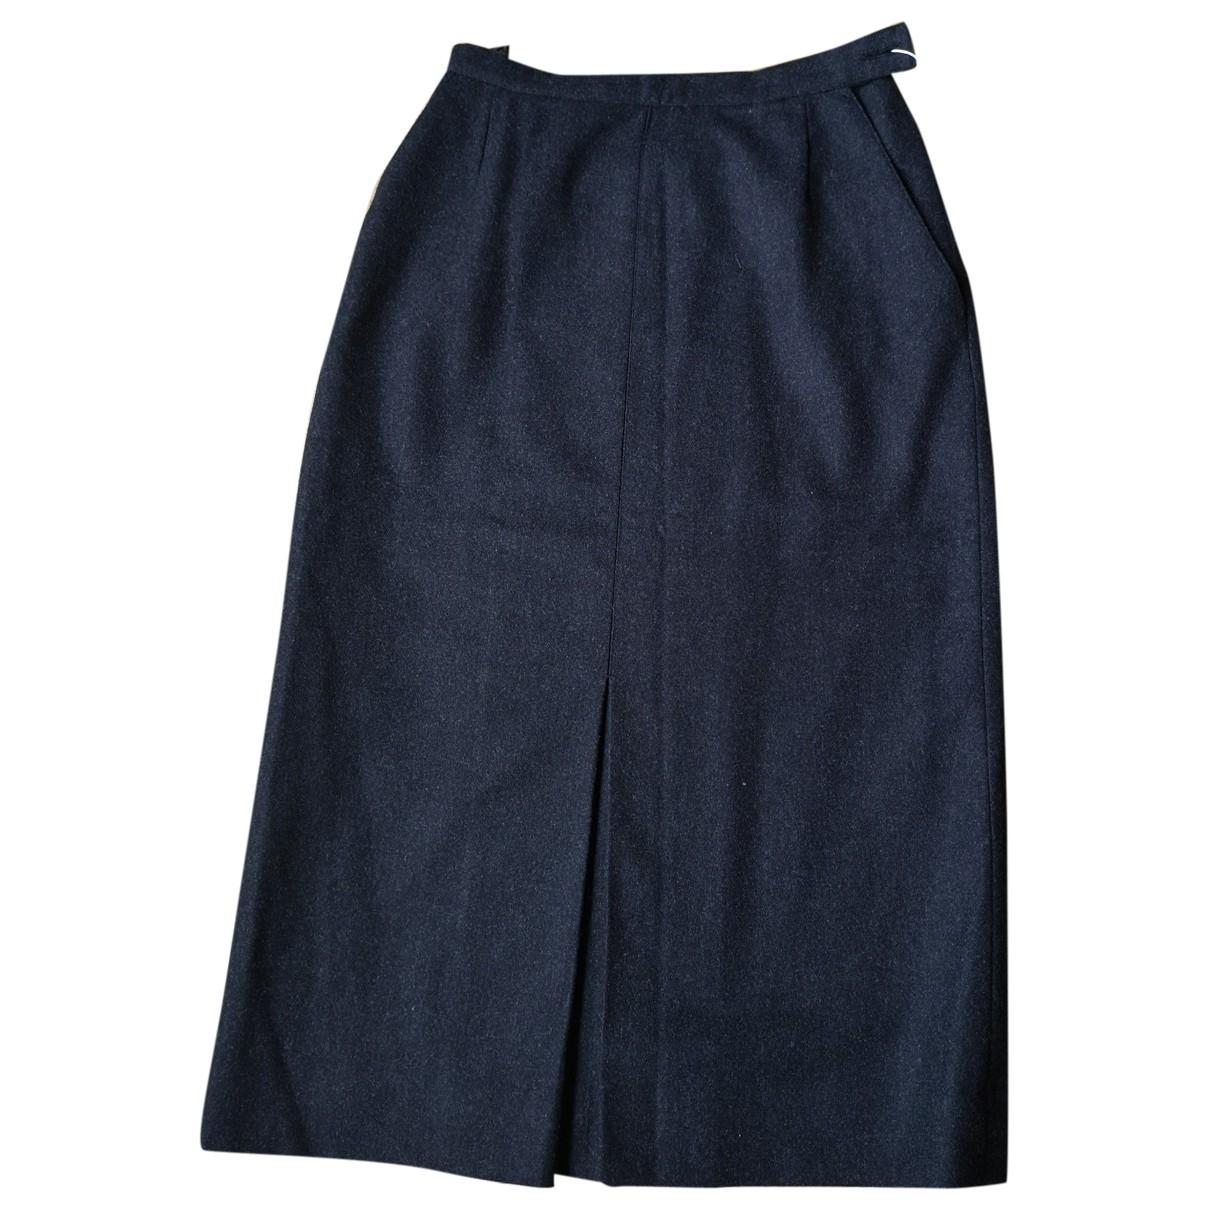 Chanel \N Grey Wool skirt for Women 36 FR